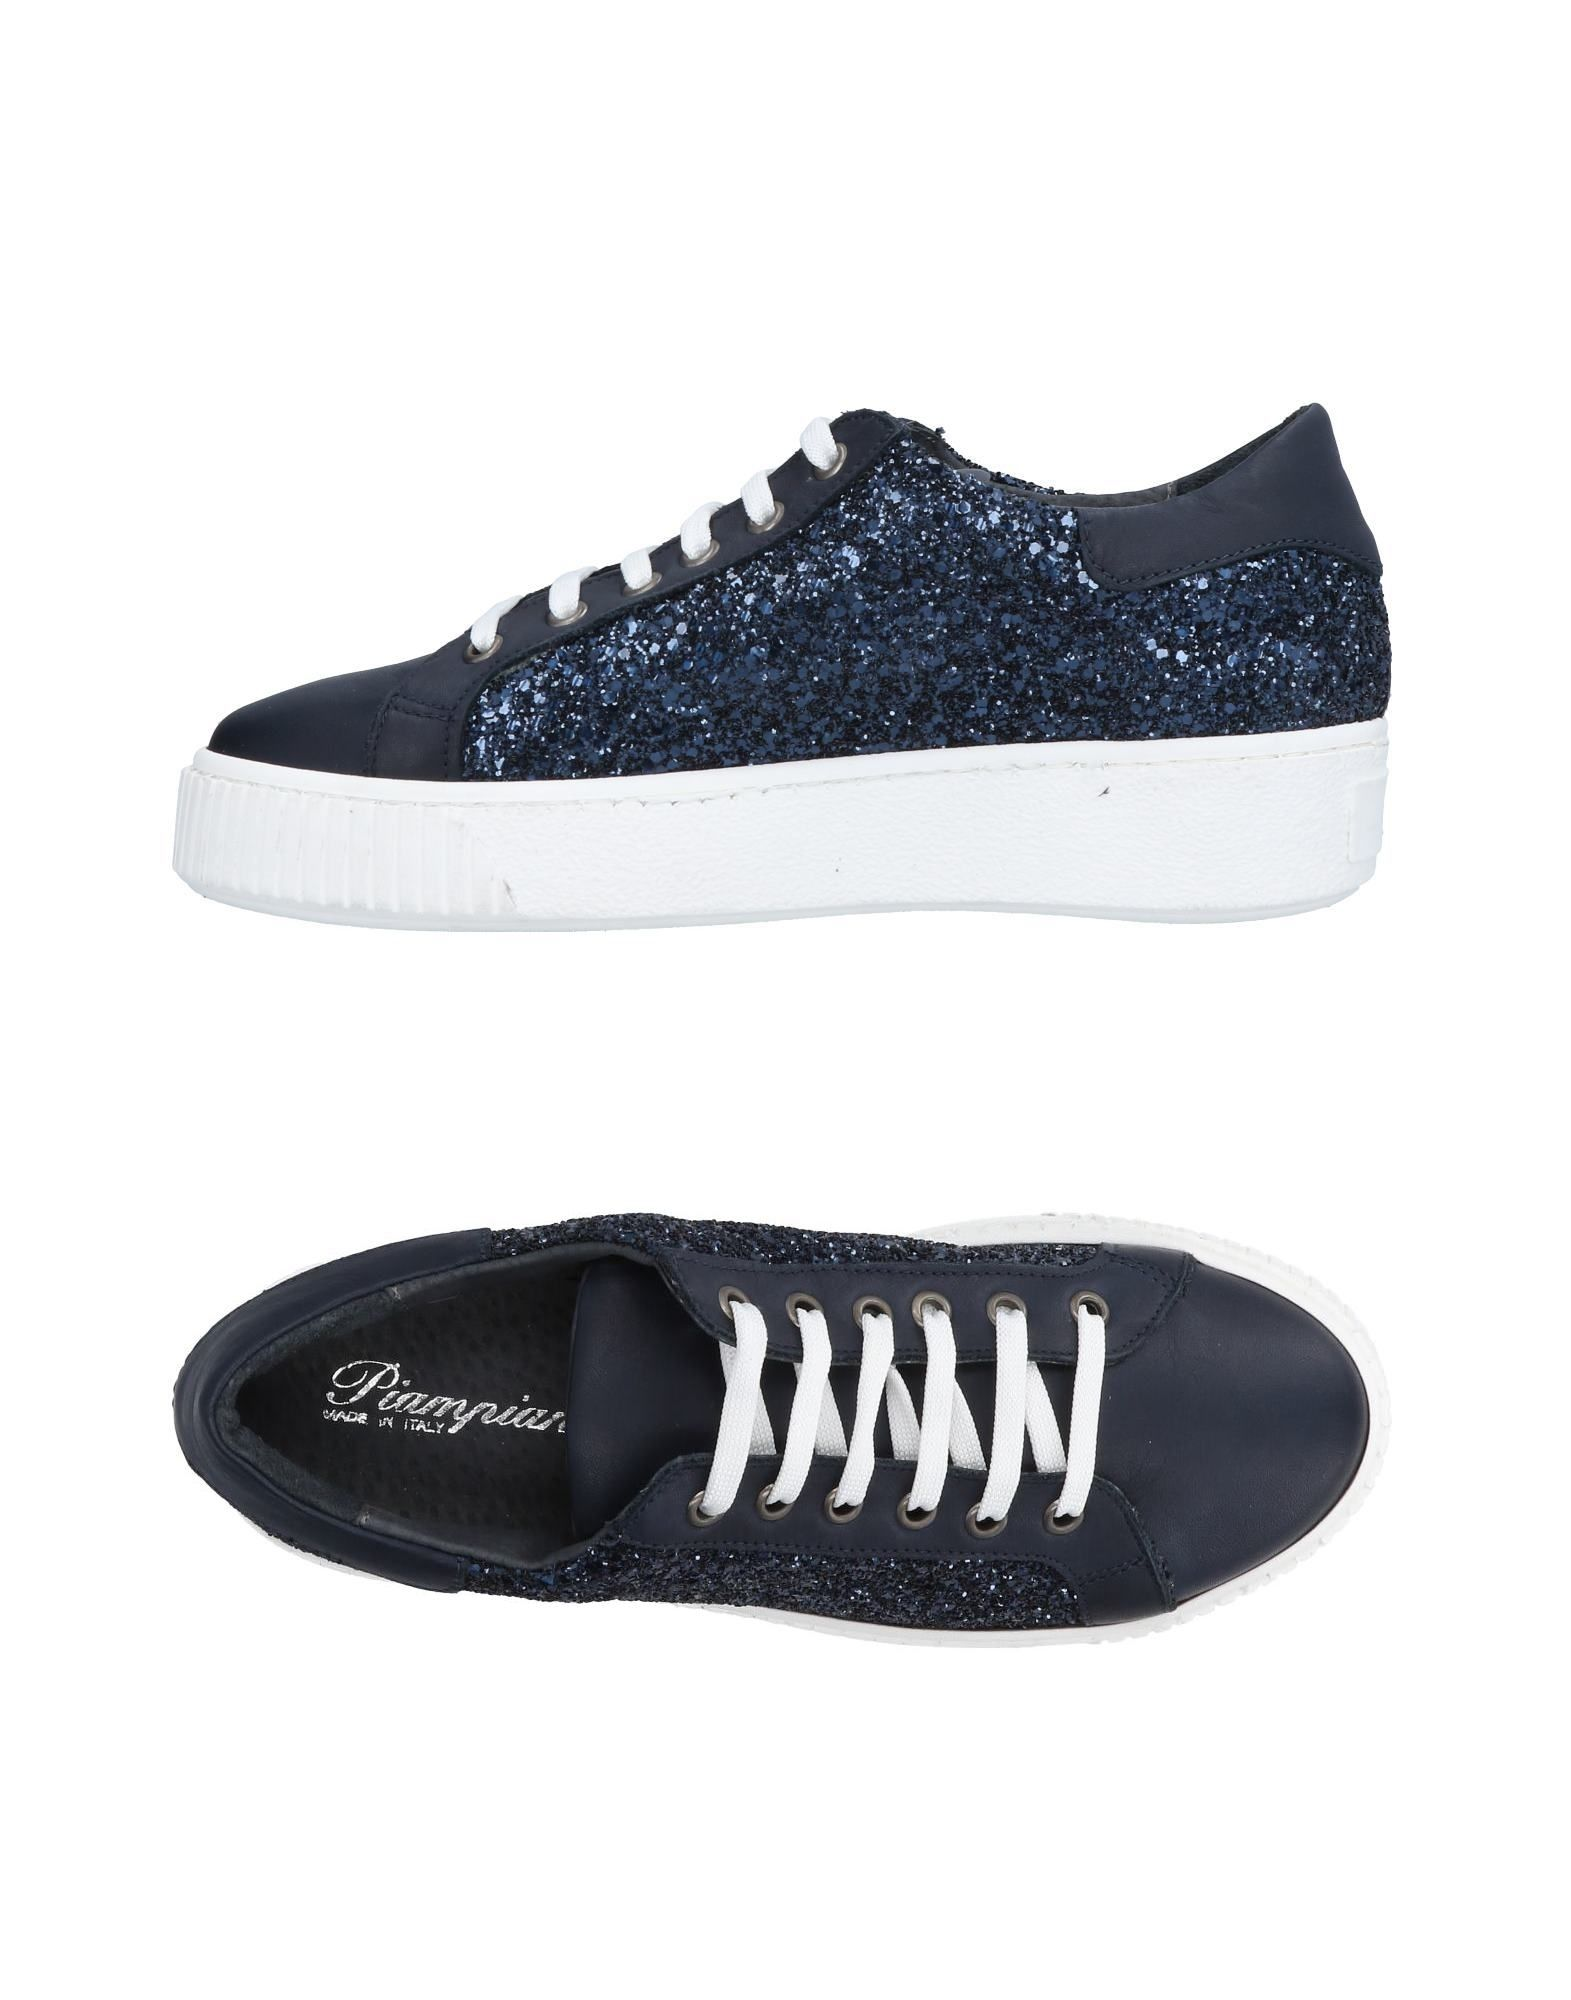 Piampiani Sneakers Damen beliebte  11491358OT Gute Qualität beliebte Damen Schuhe 72d5c2